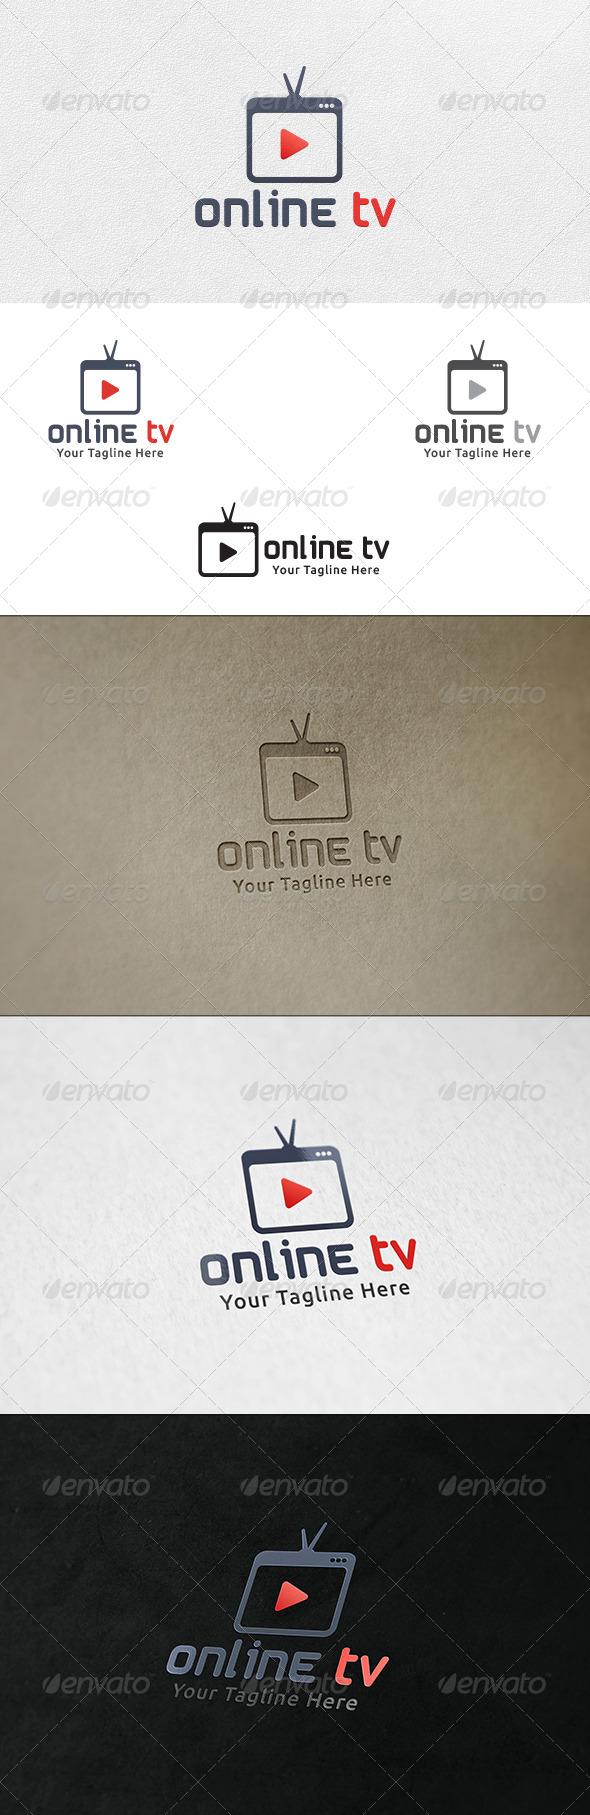 GraphicRiver Online TV Logo Template 6677992